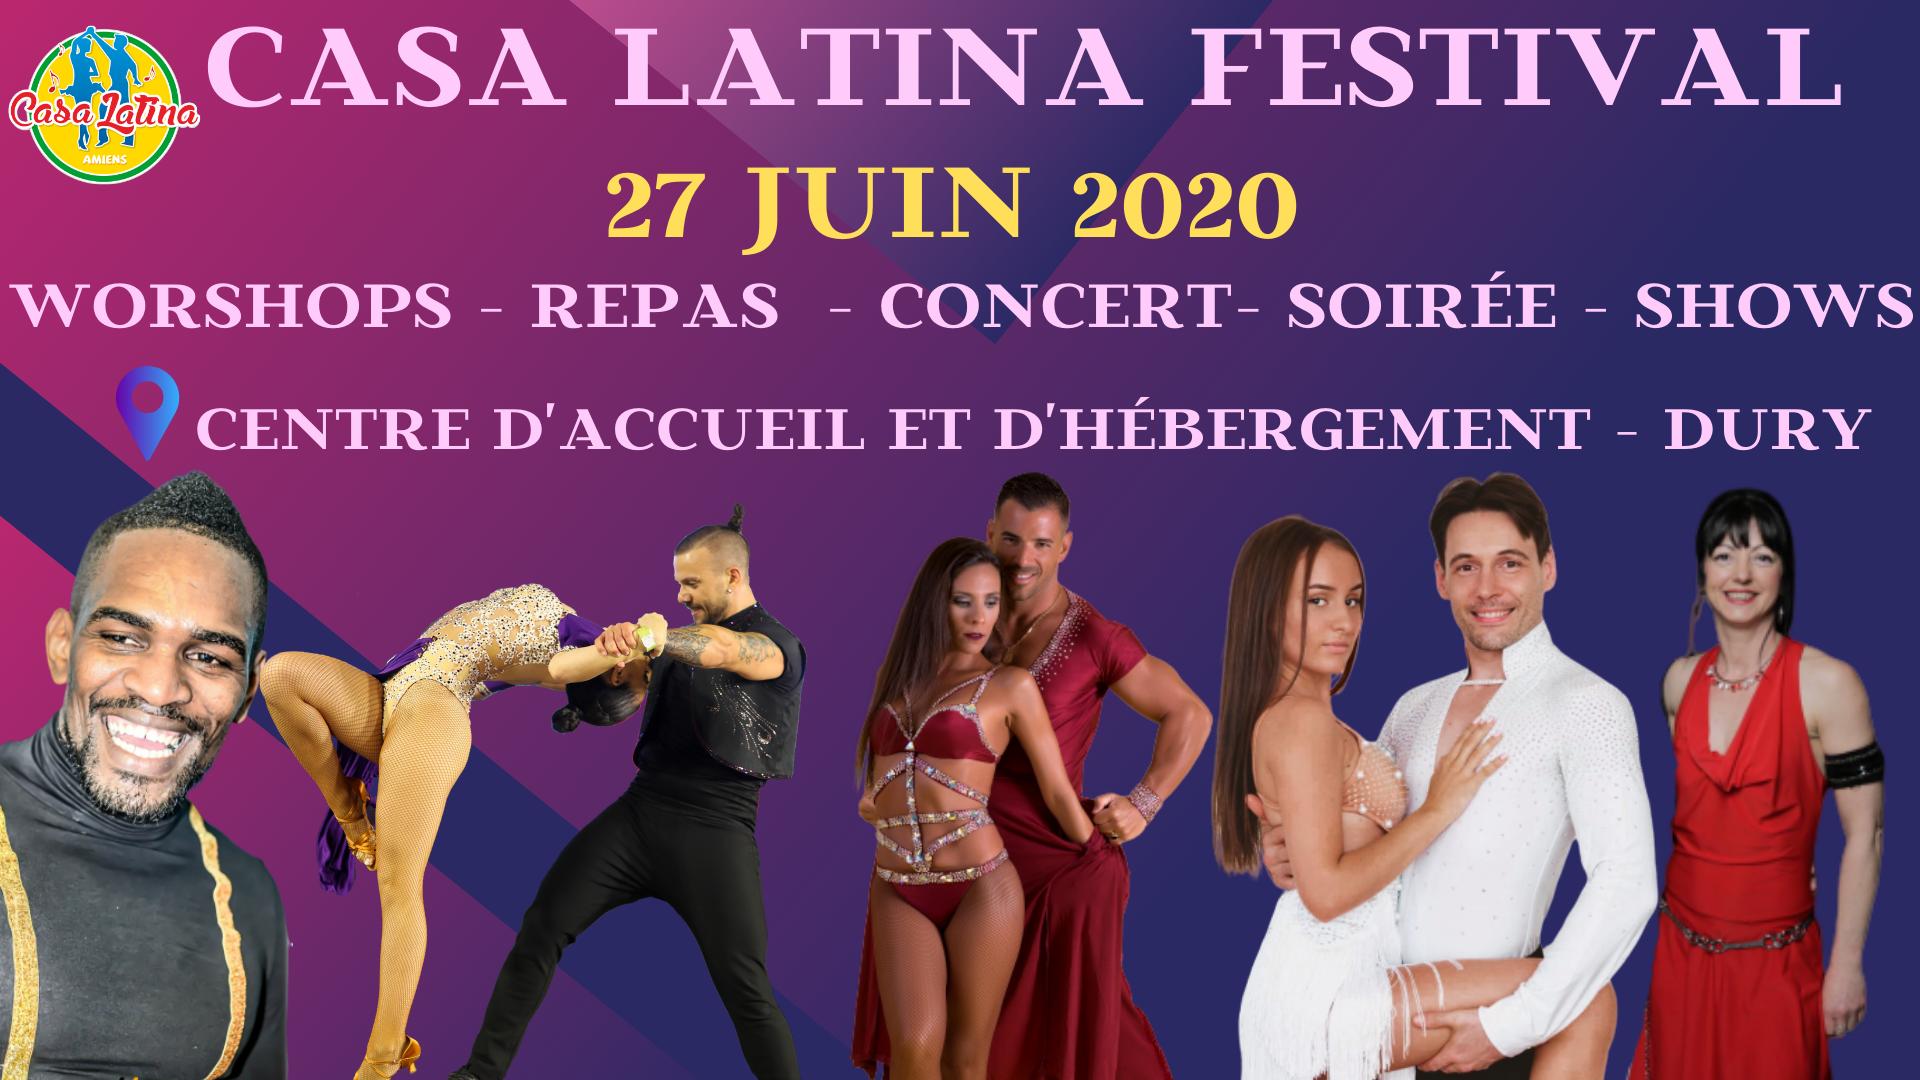 FESTIVAL CASA LATINA 2020